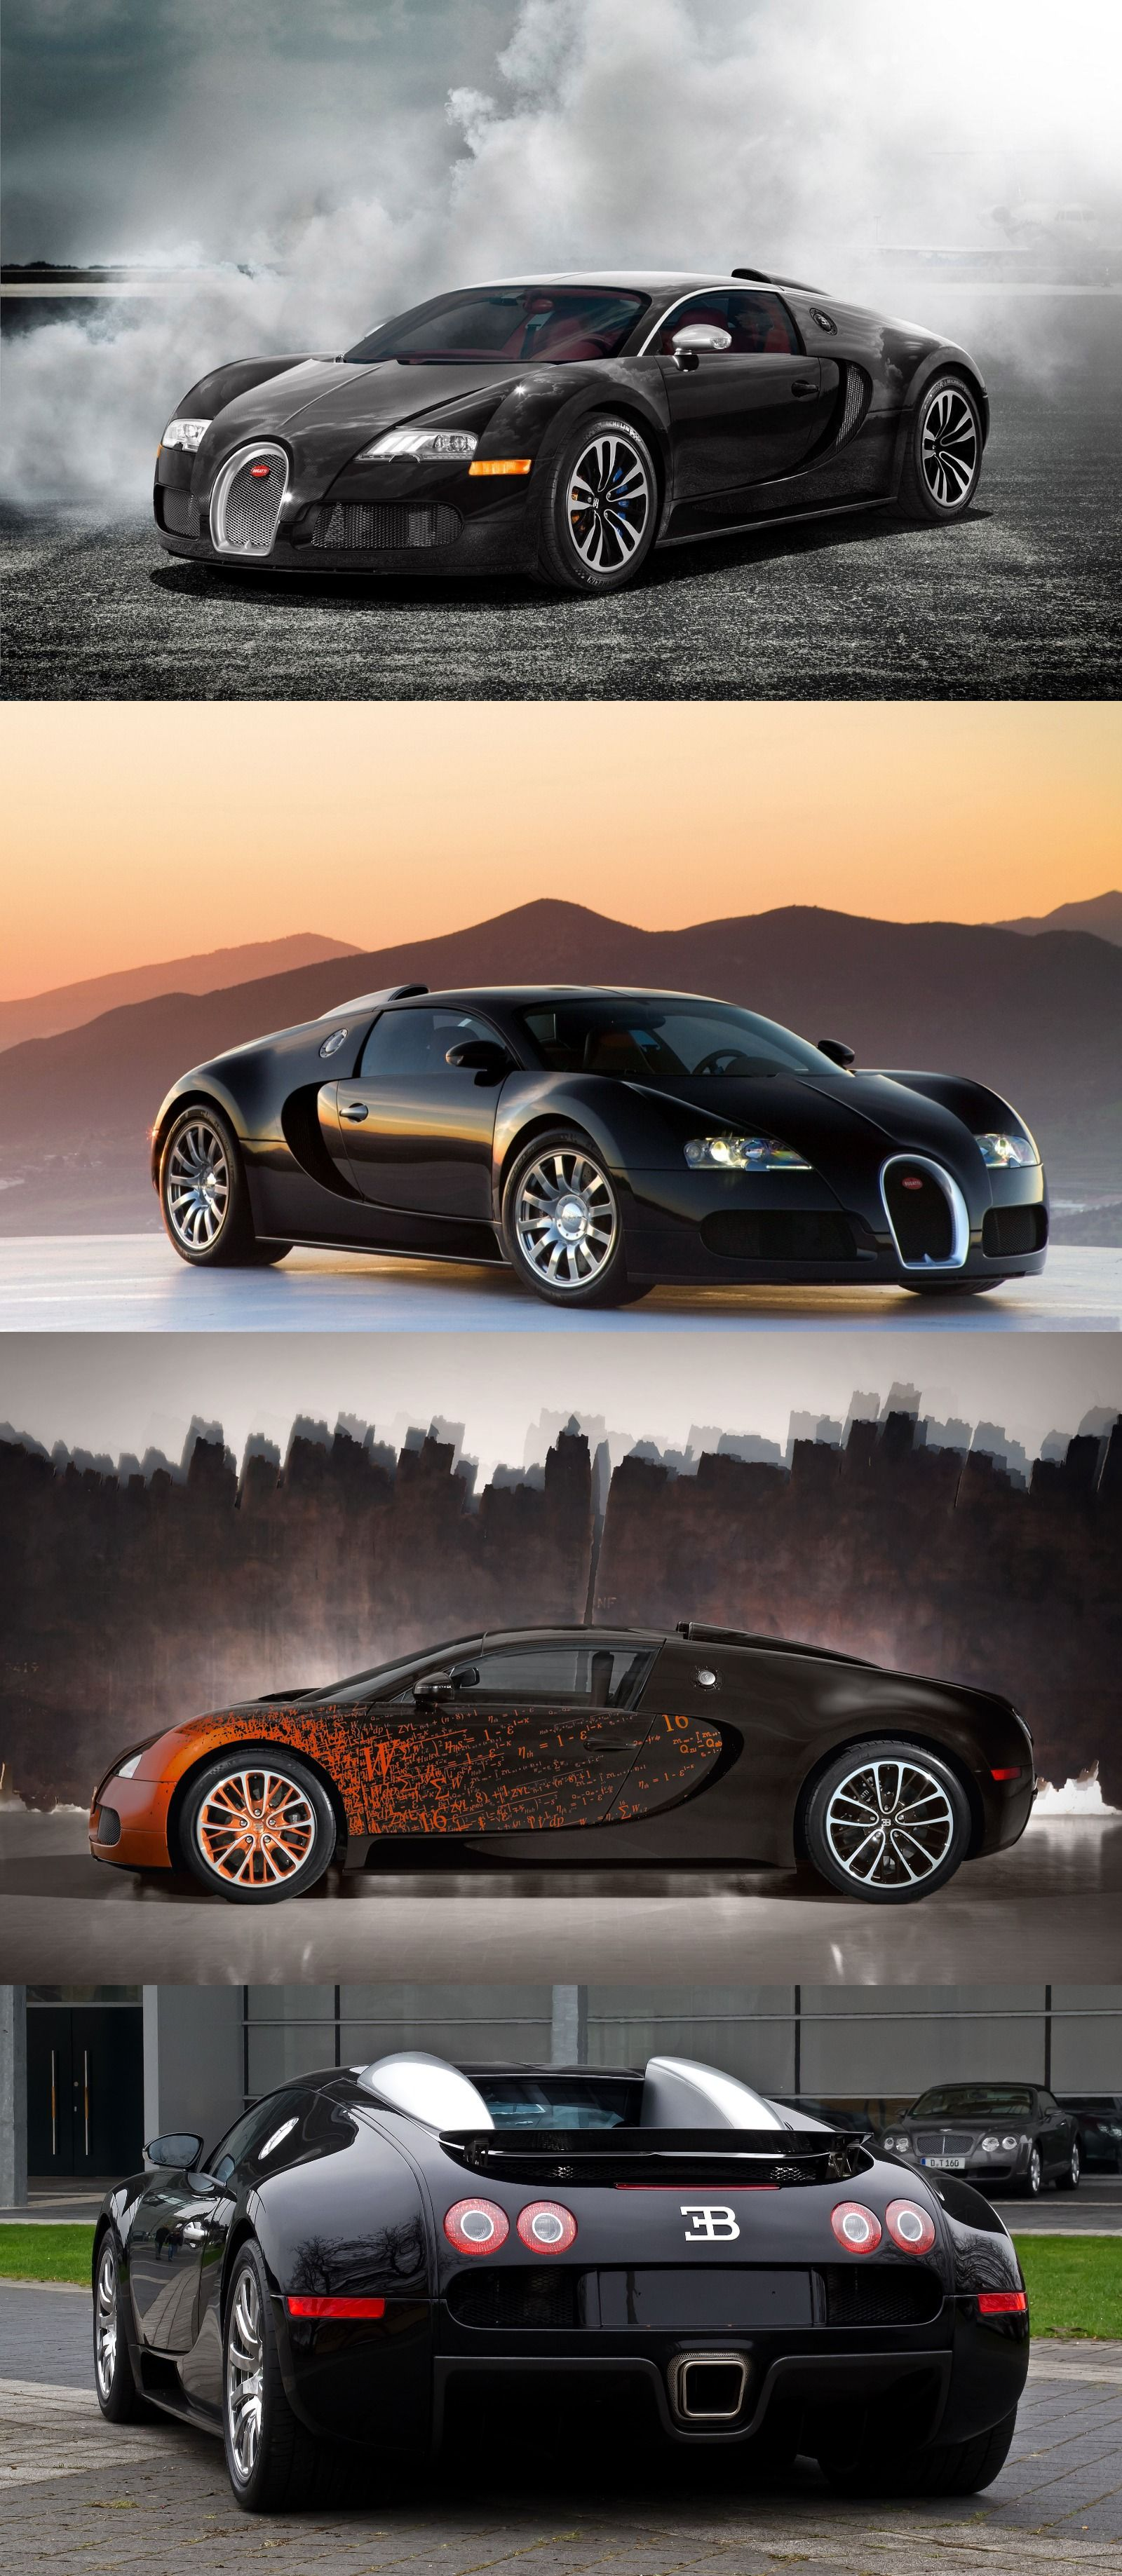 d313550bd59063d674b3e8935c57acae Inspiring Bugatti Veyron Quarter Mile Speed Cars Trend